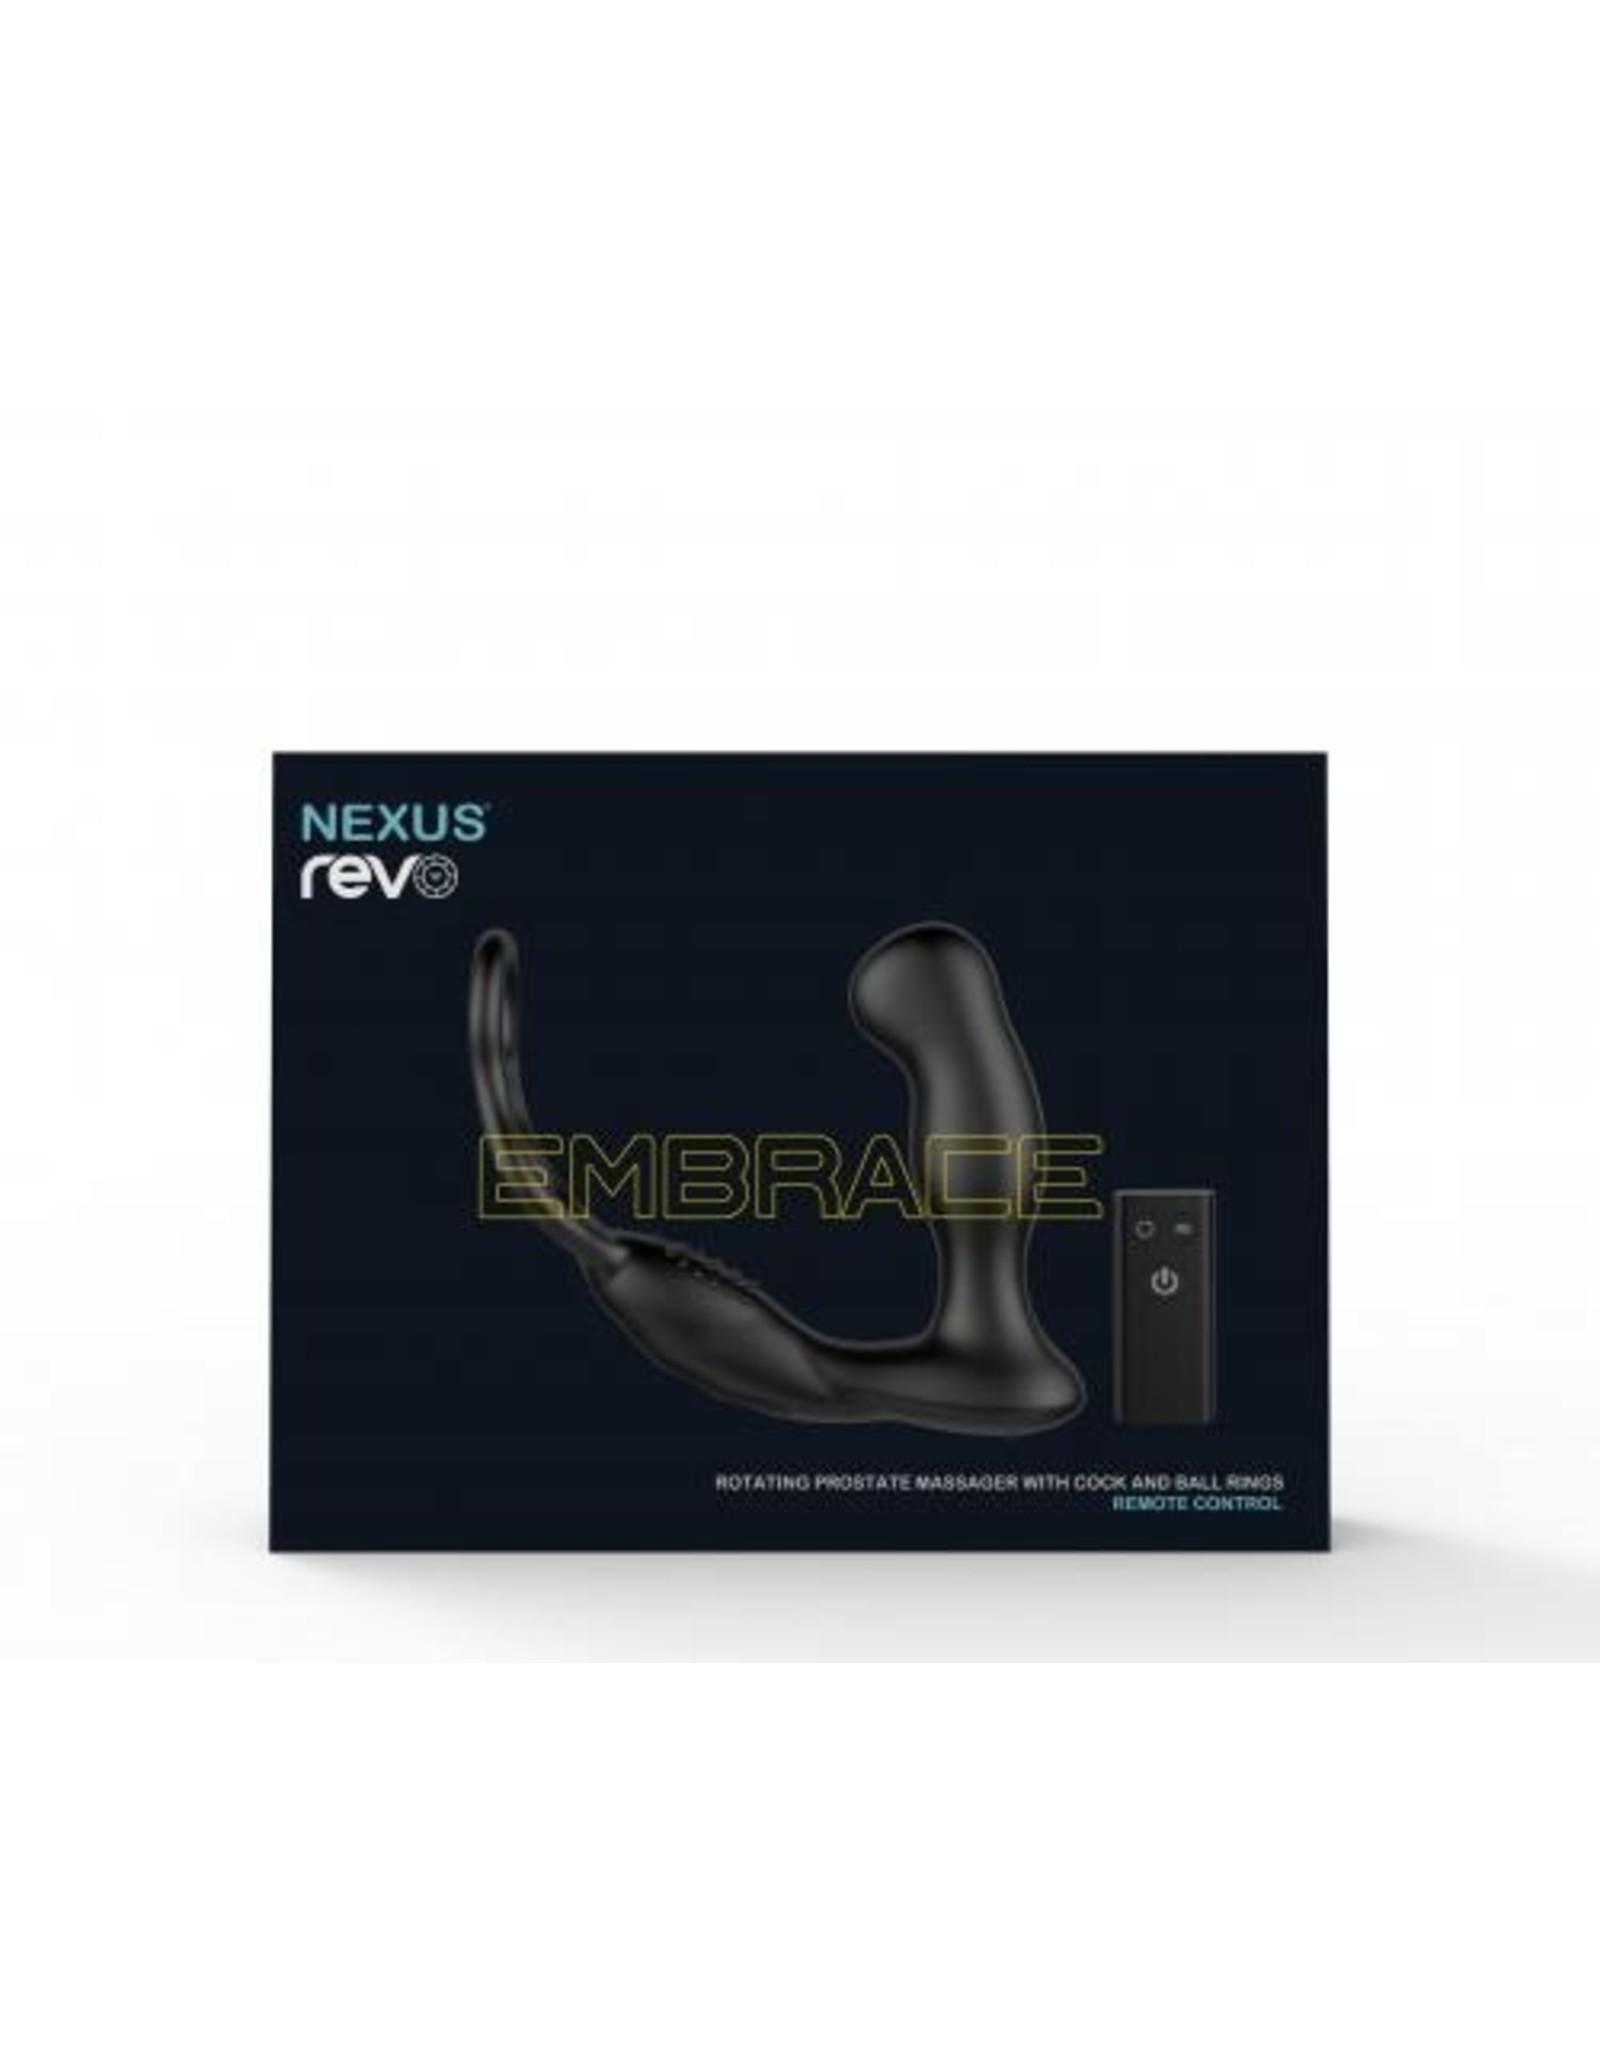 Nexus Nexus Revo Embrace Vibrerende Prostaat Stimulator